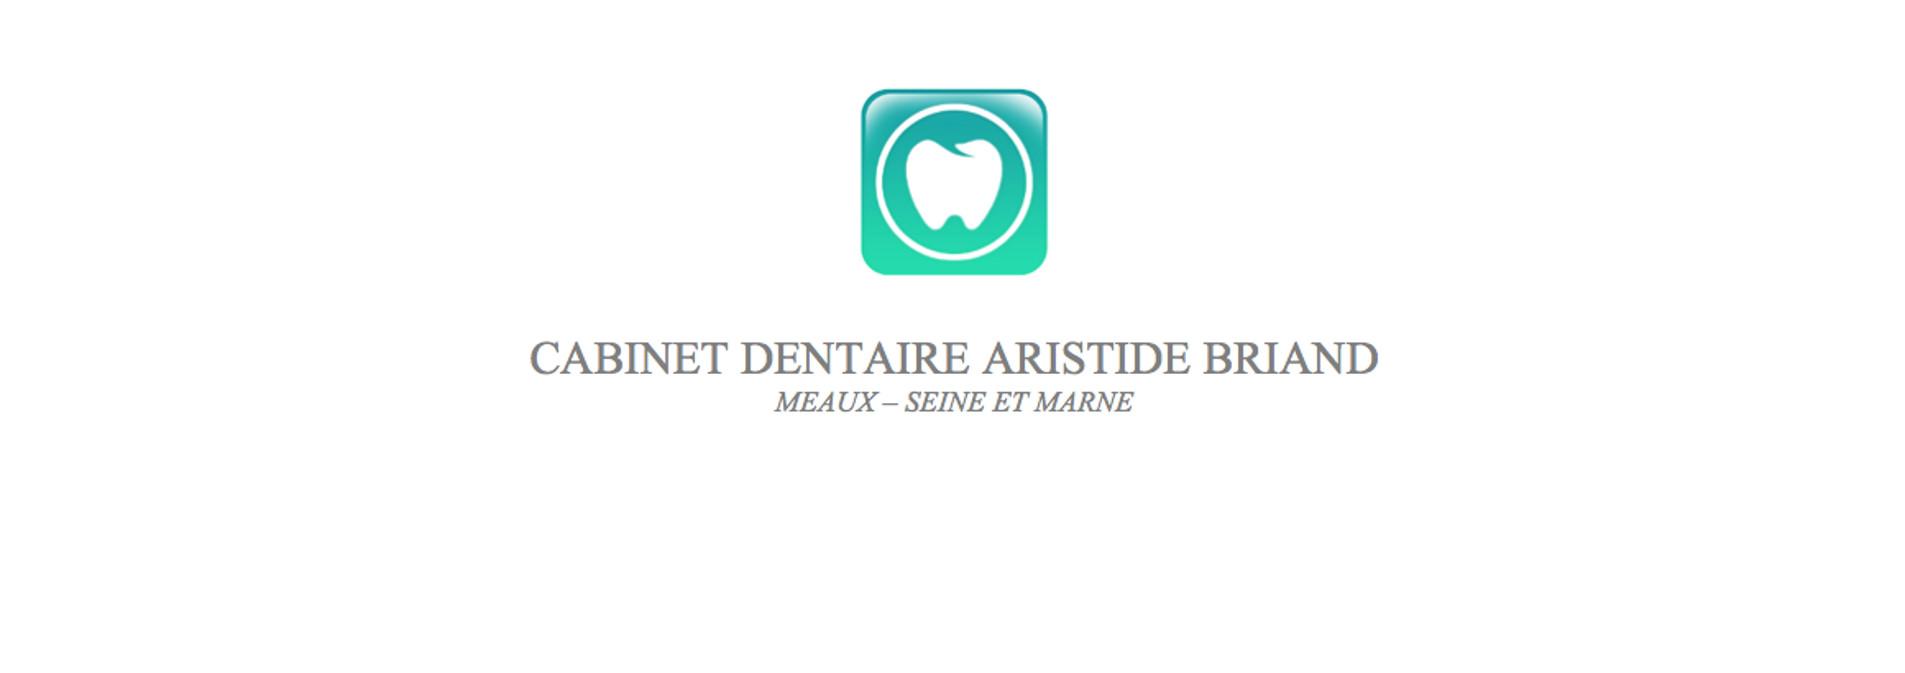 dentiste meaux cabinet dentaire aristide briand. Black Bedroom Furniture Sets. Home Design Ideas